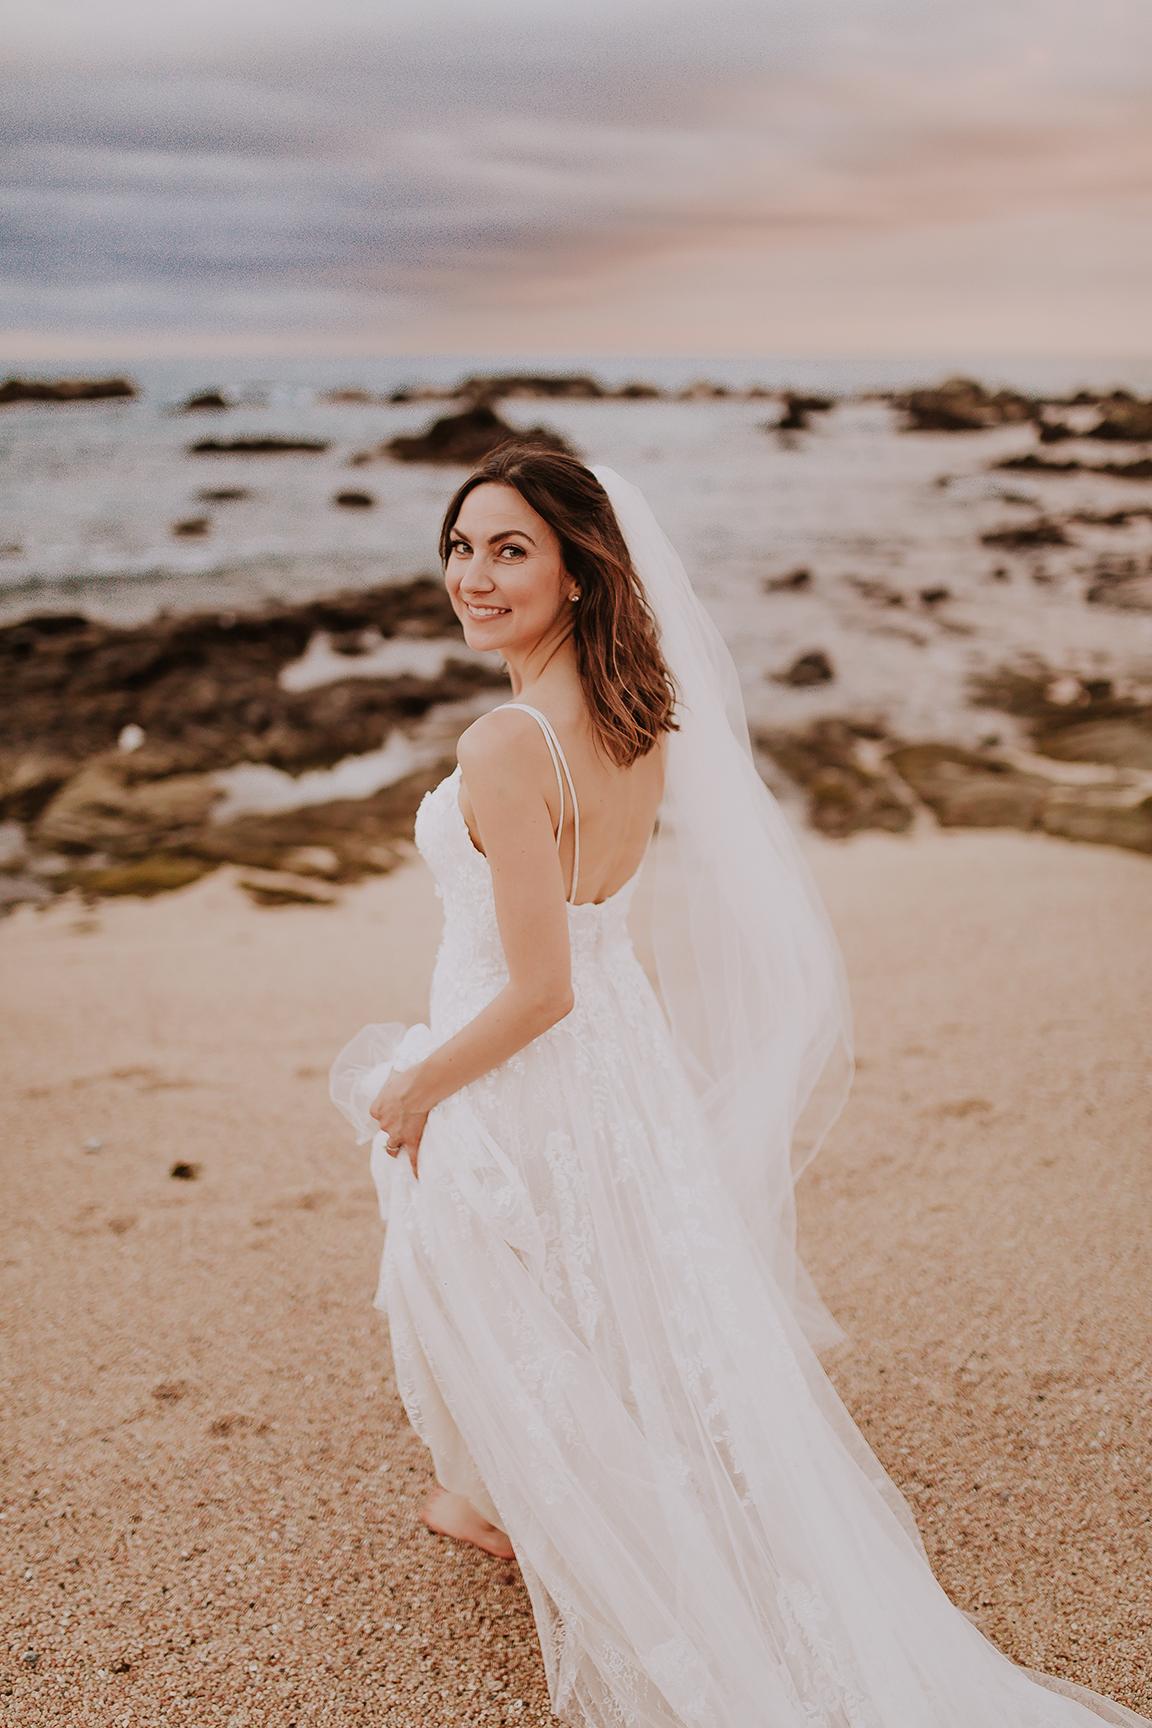 Lindsei+James_cabo_wedding_816.jpg